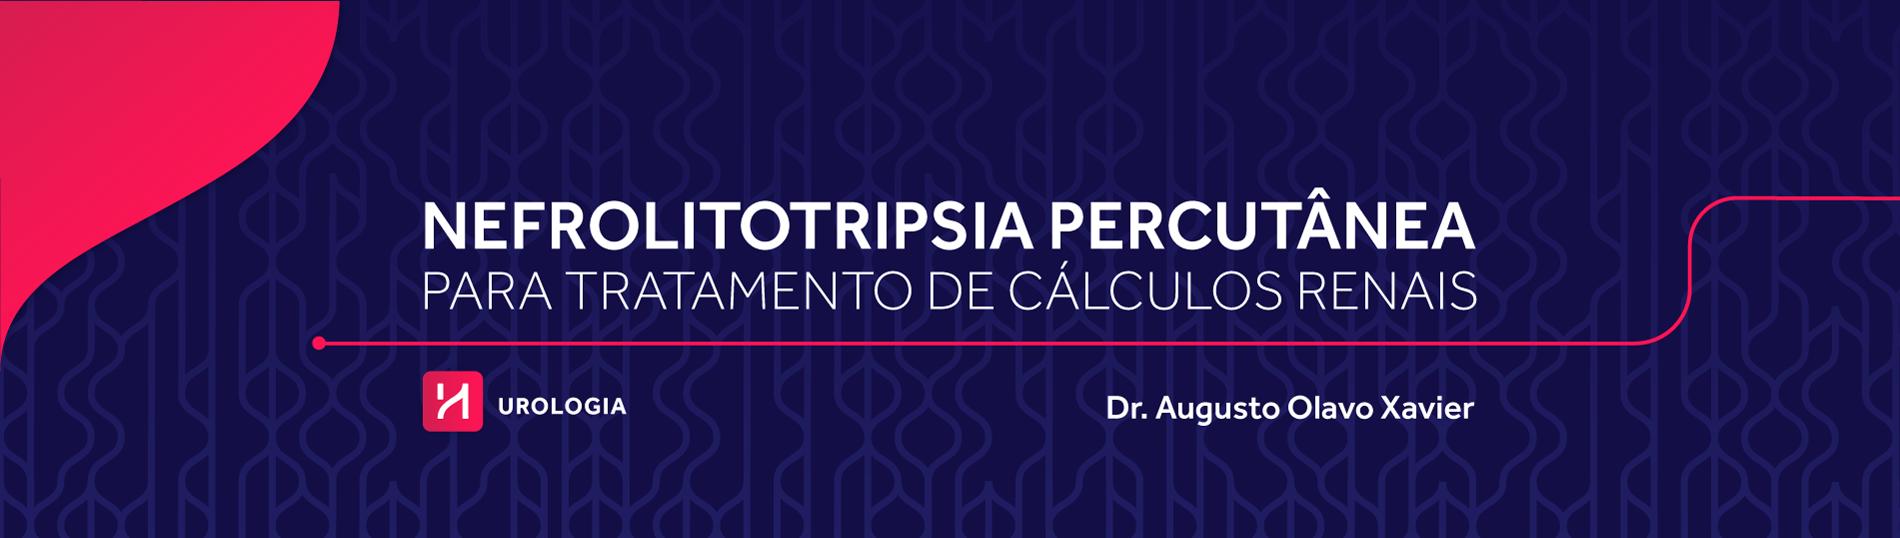 Nefrolitotripsia Percutânea para tratamento de cálculos renais